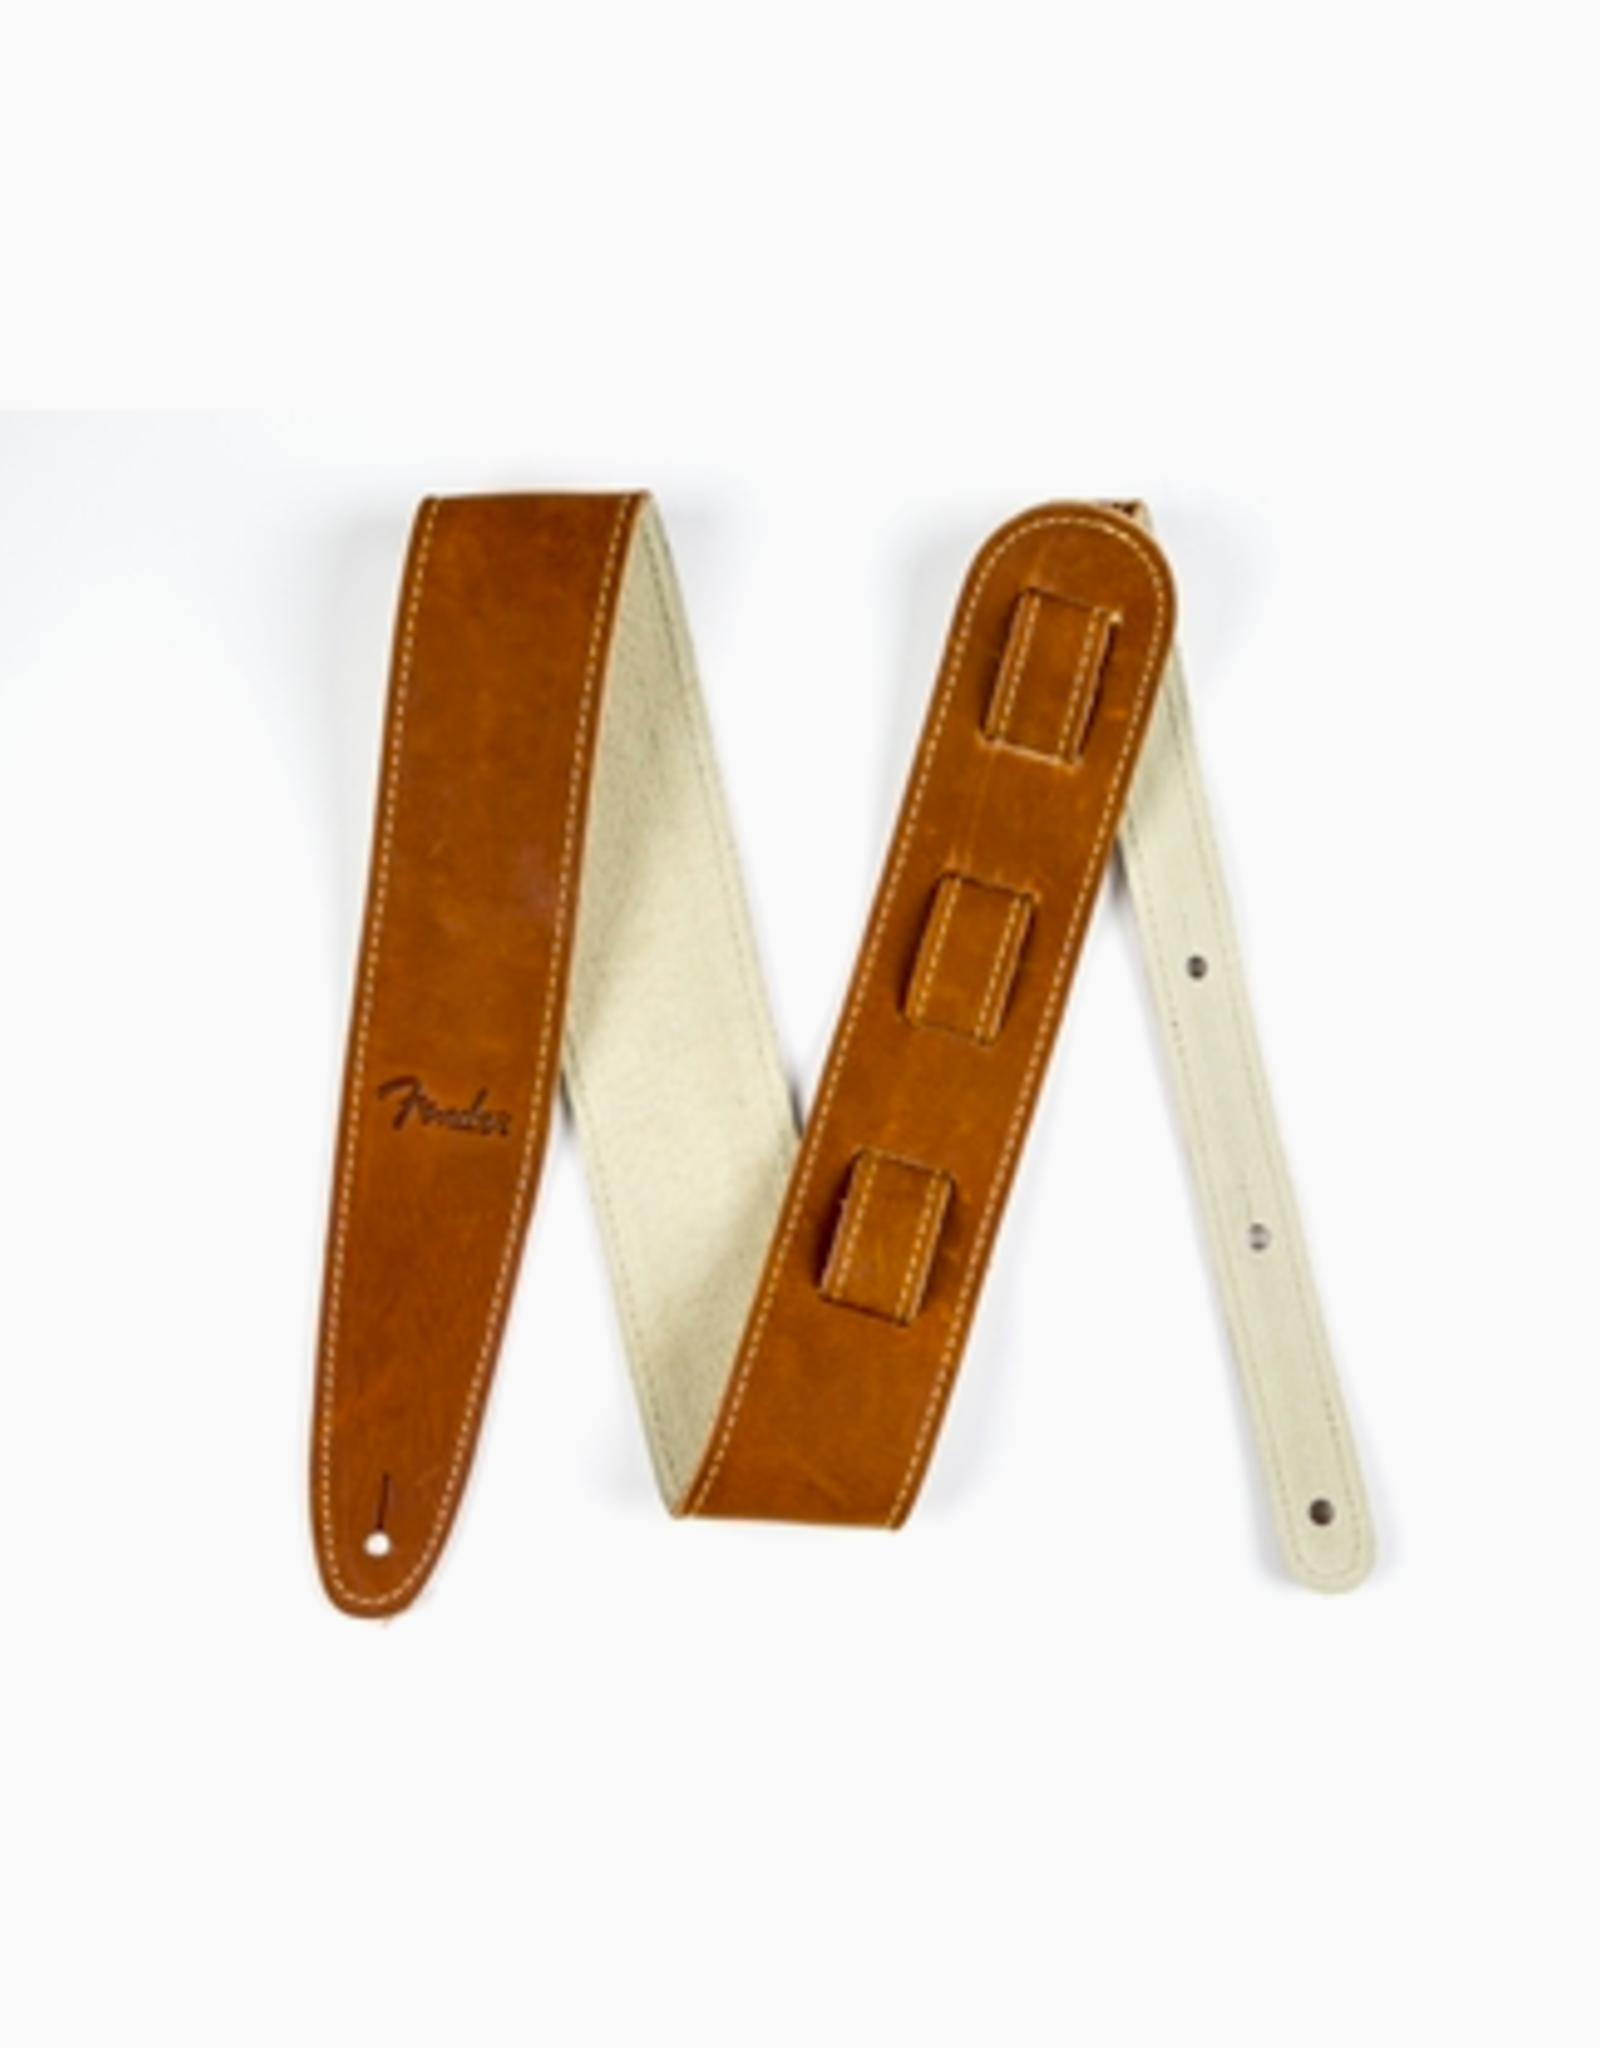 Fender Fender Ball Glove Leather Strap, Brown